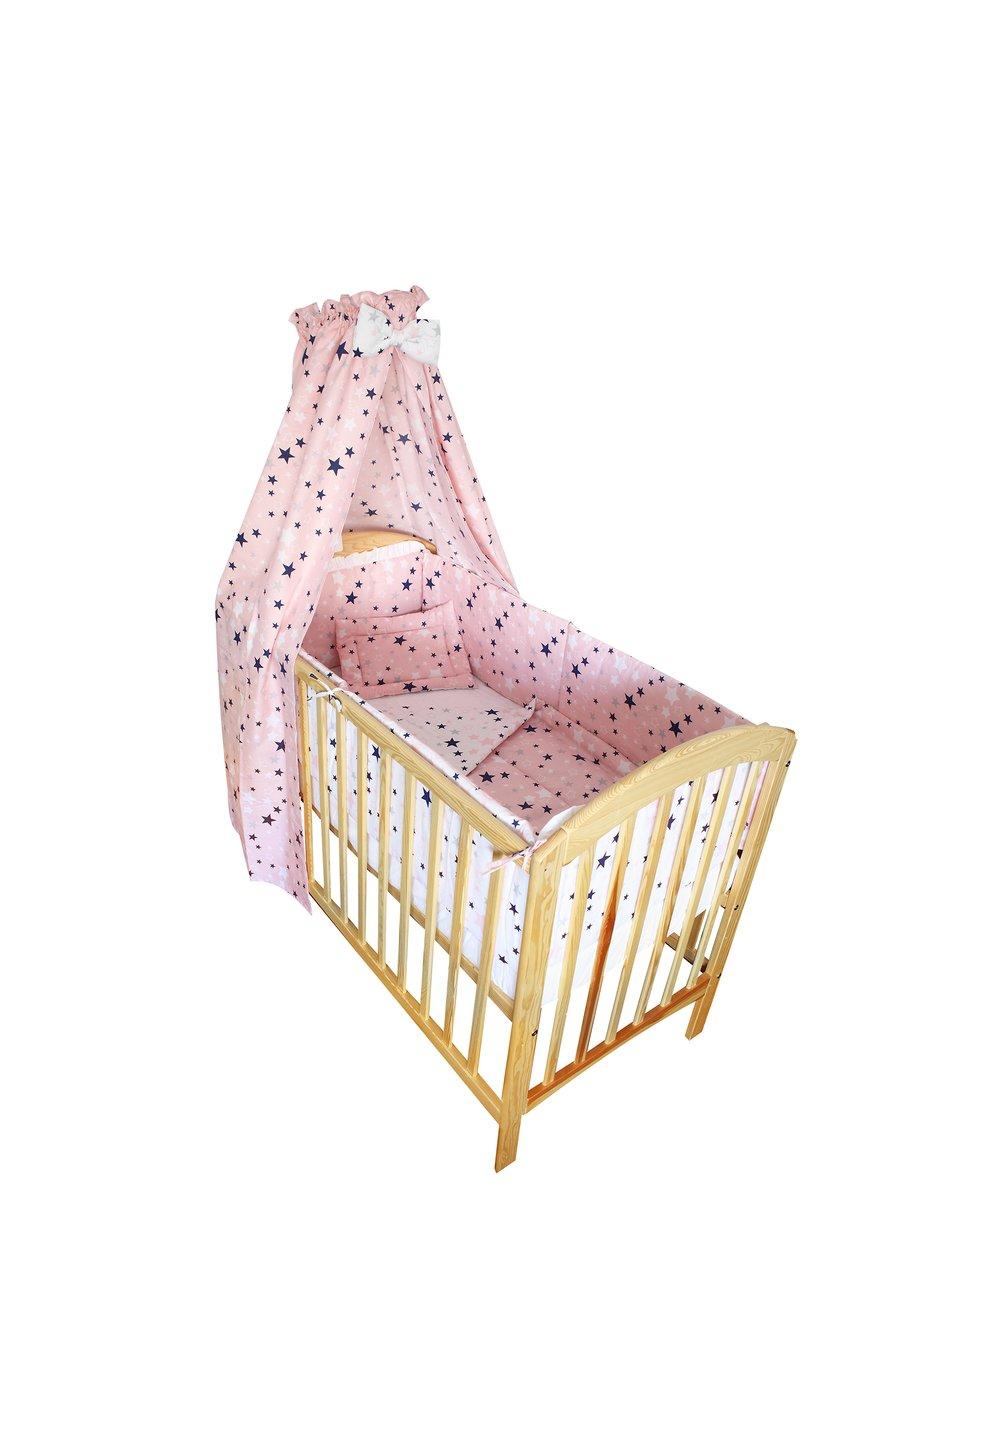 Baldachin patut, stelutele, roz, 200 x 150 cm imagine